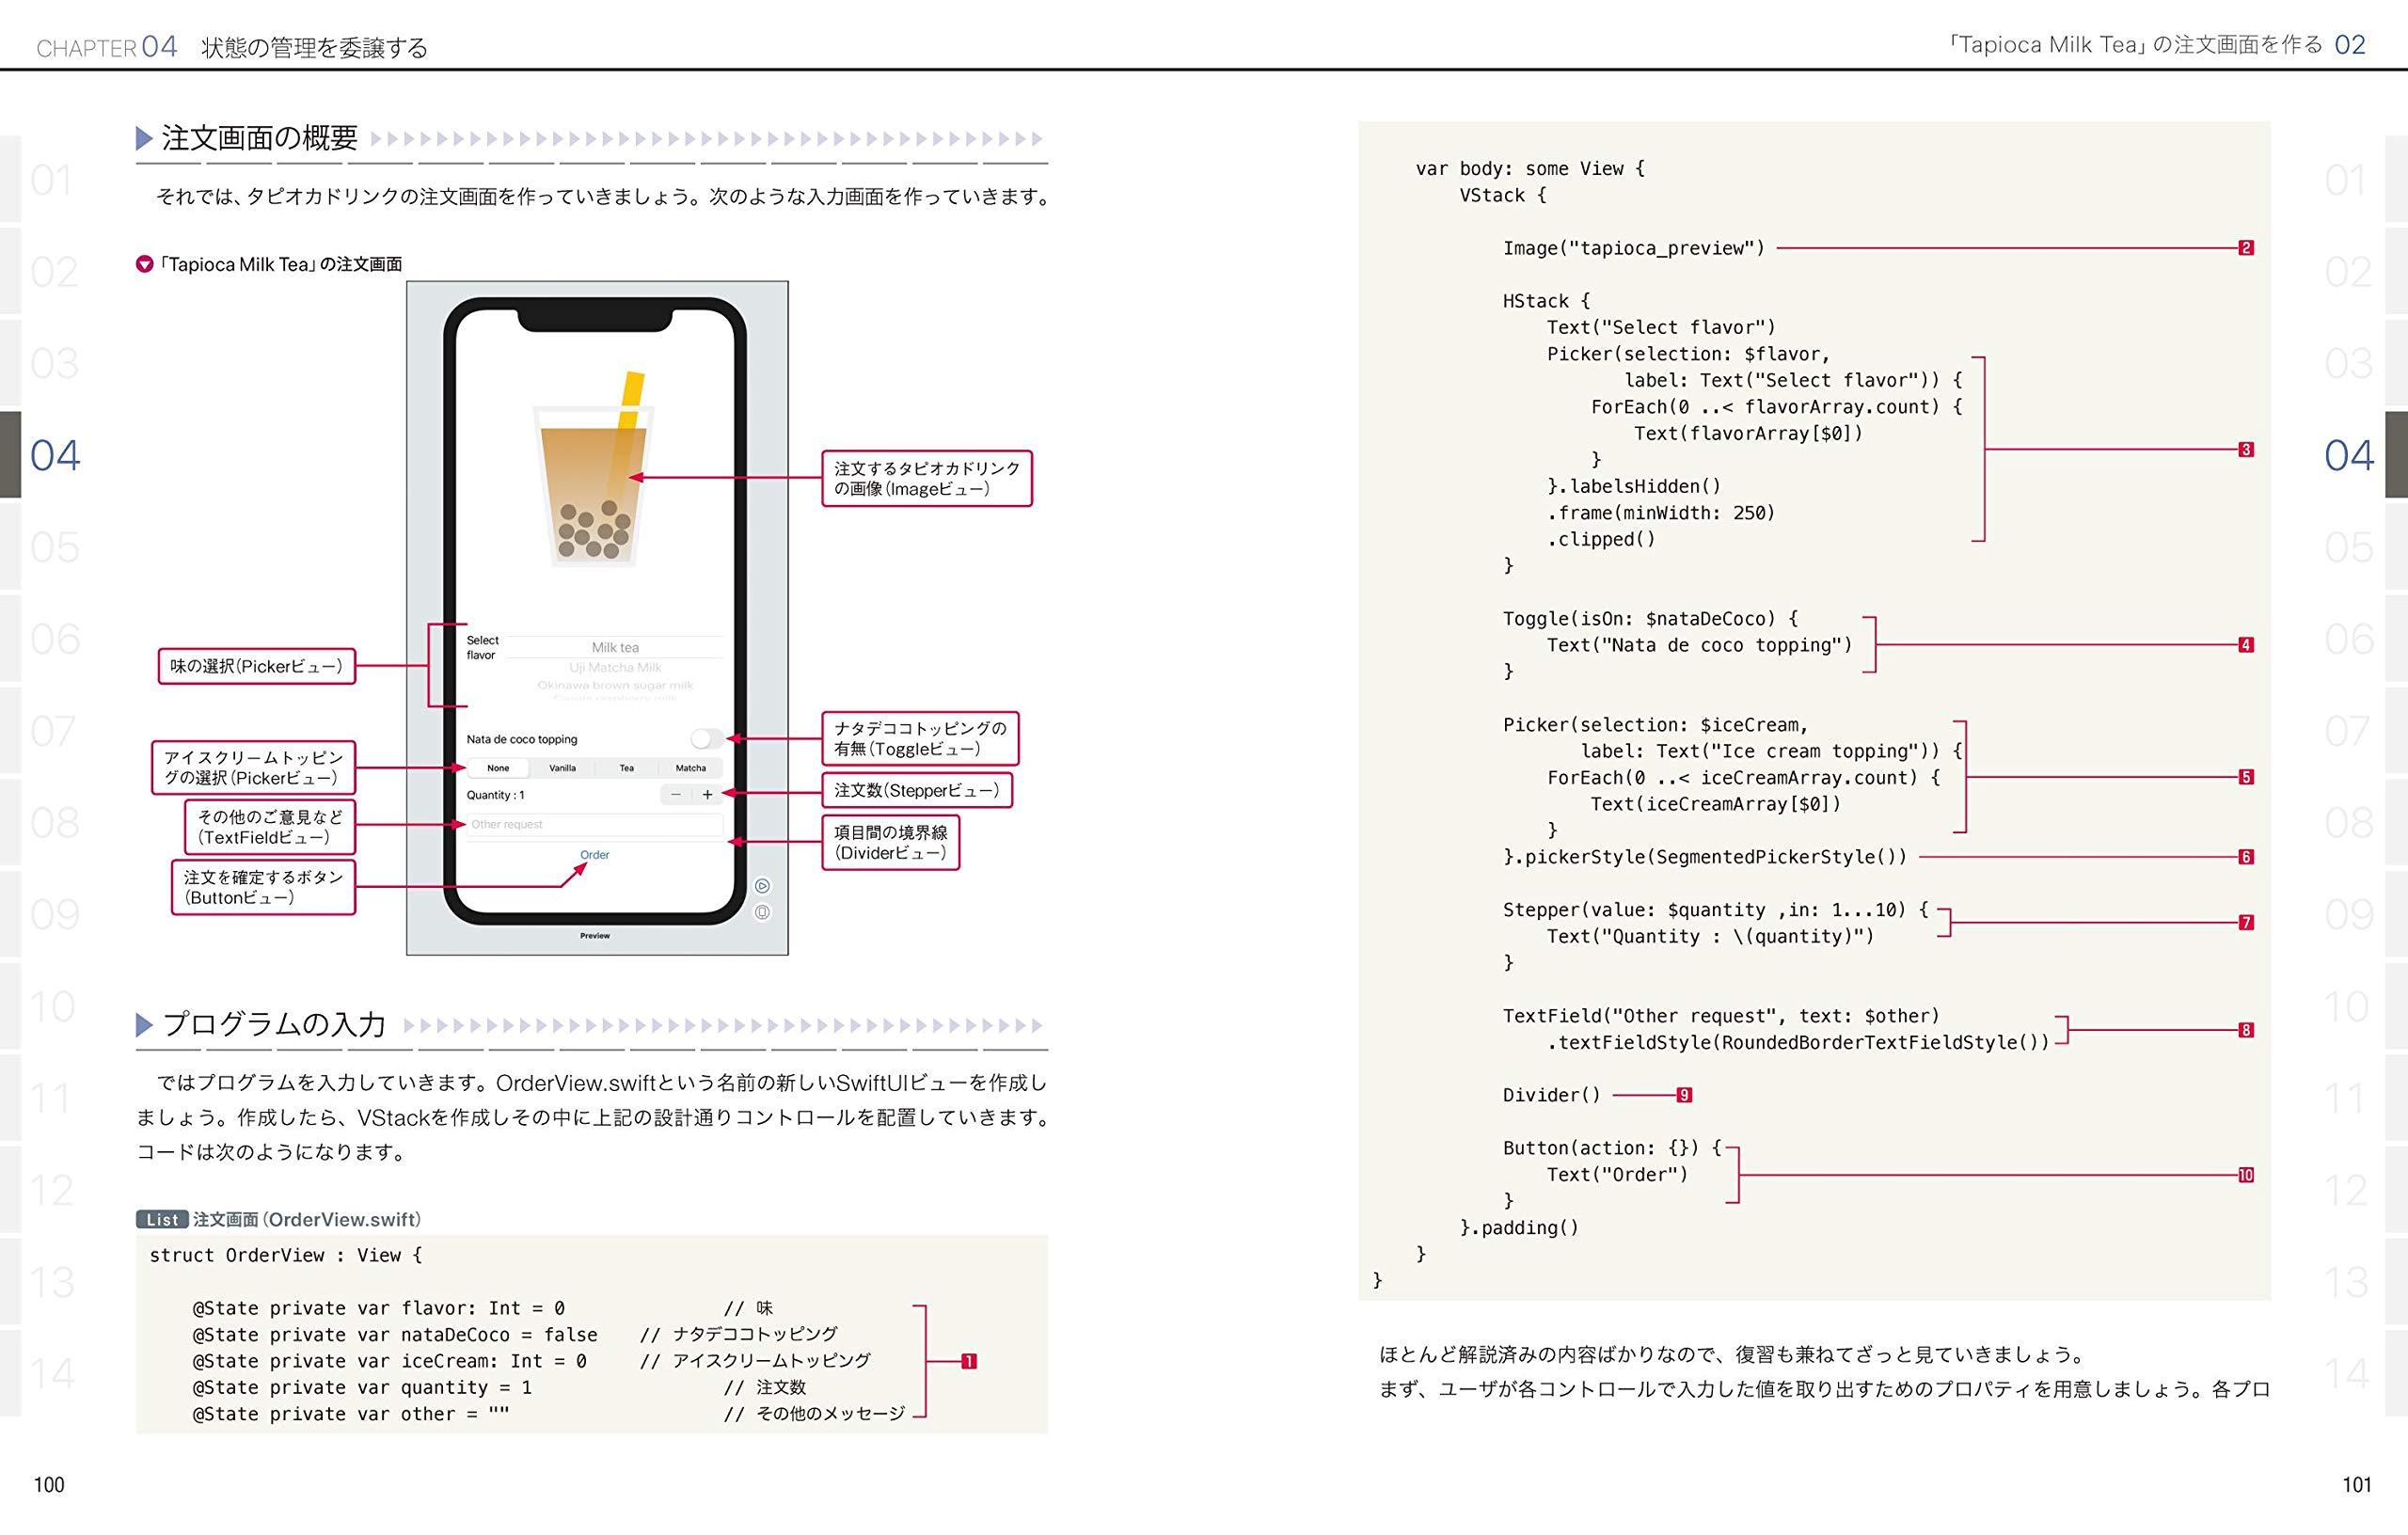 Thumbnail of SwiftUI 徹底入門2$